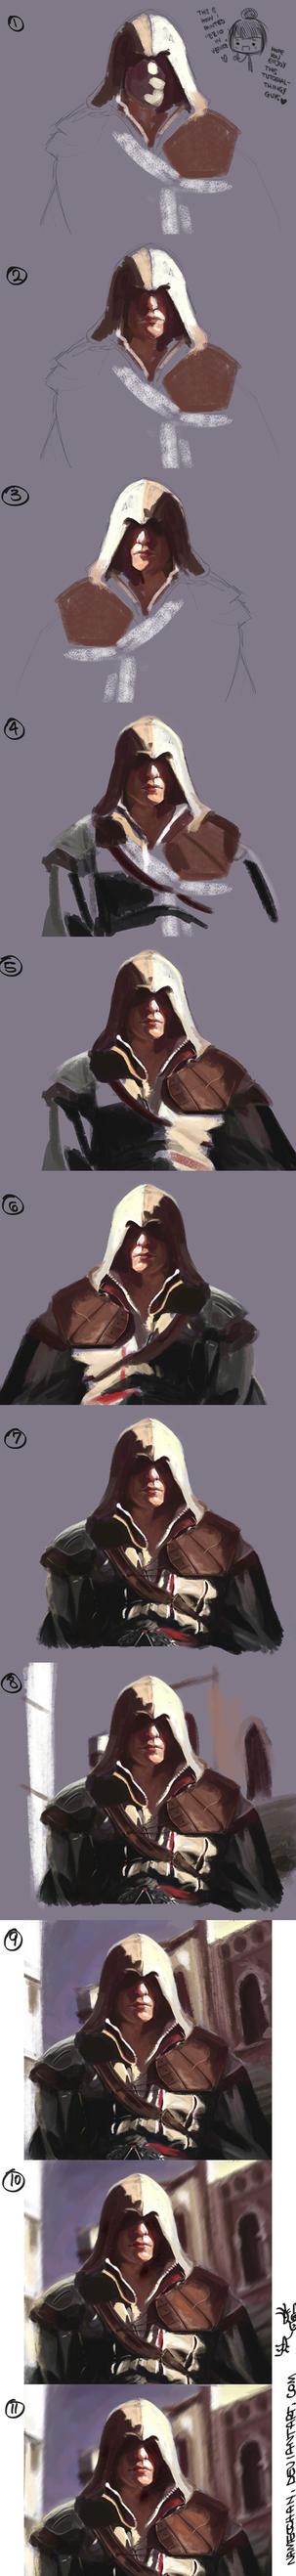 Ezio in Venice TUTORIAL by Namecchan